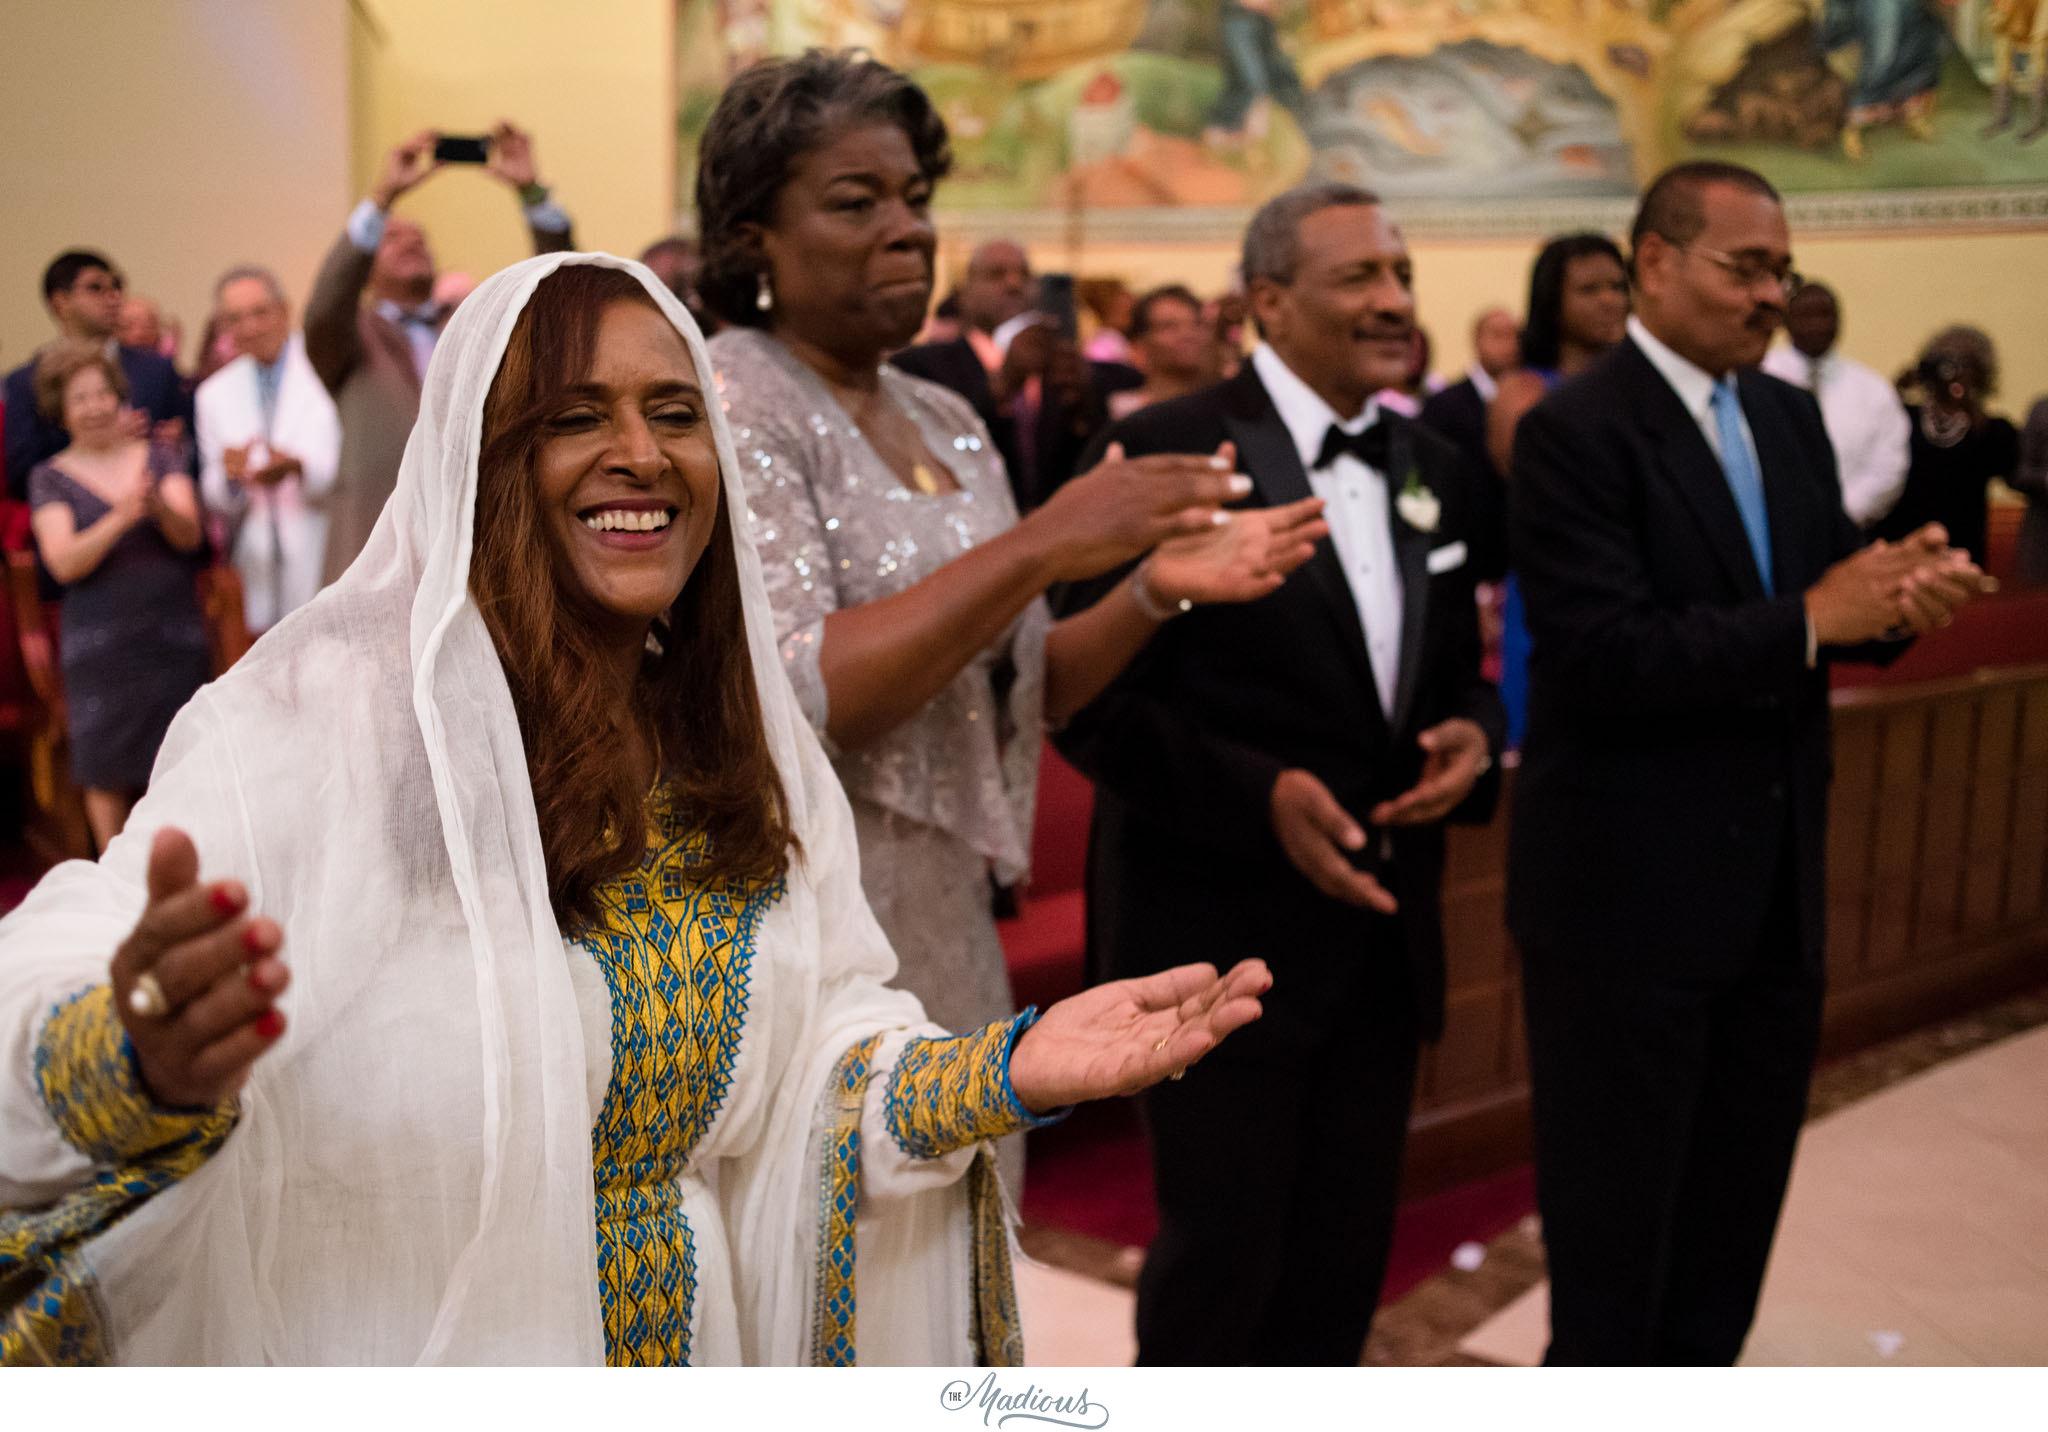 nmwa+wedding,+women+in+the+arts+wedding,+ethiopian+wedding,+dc+wedding+0099.jpg